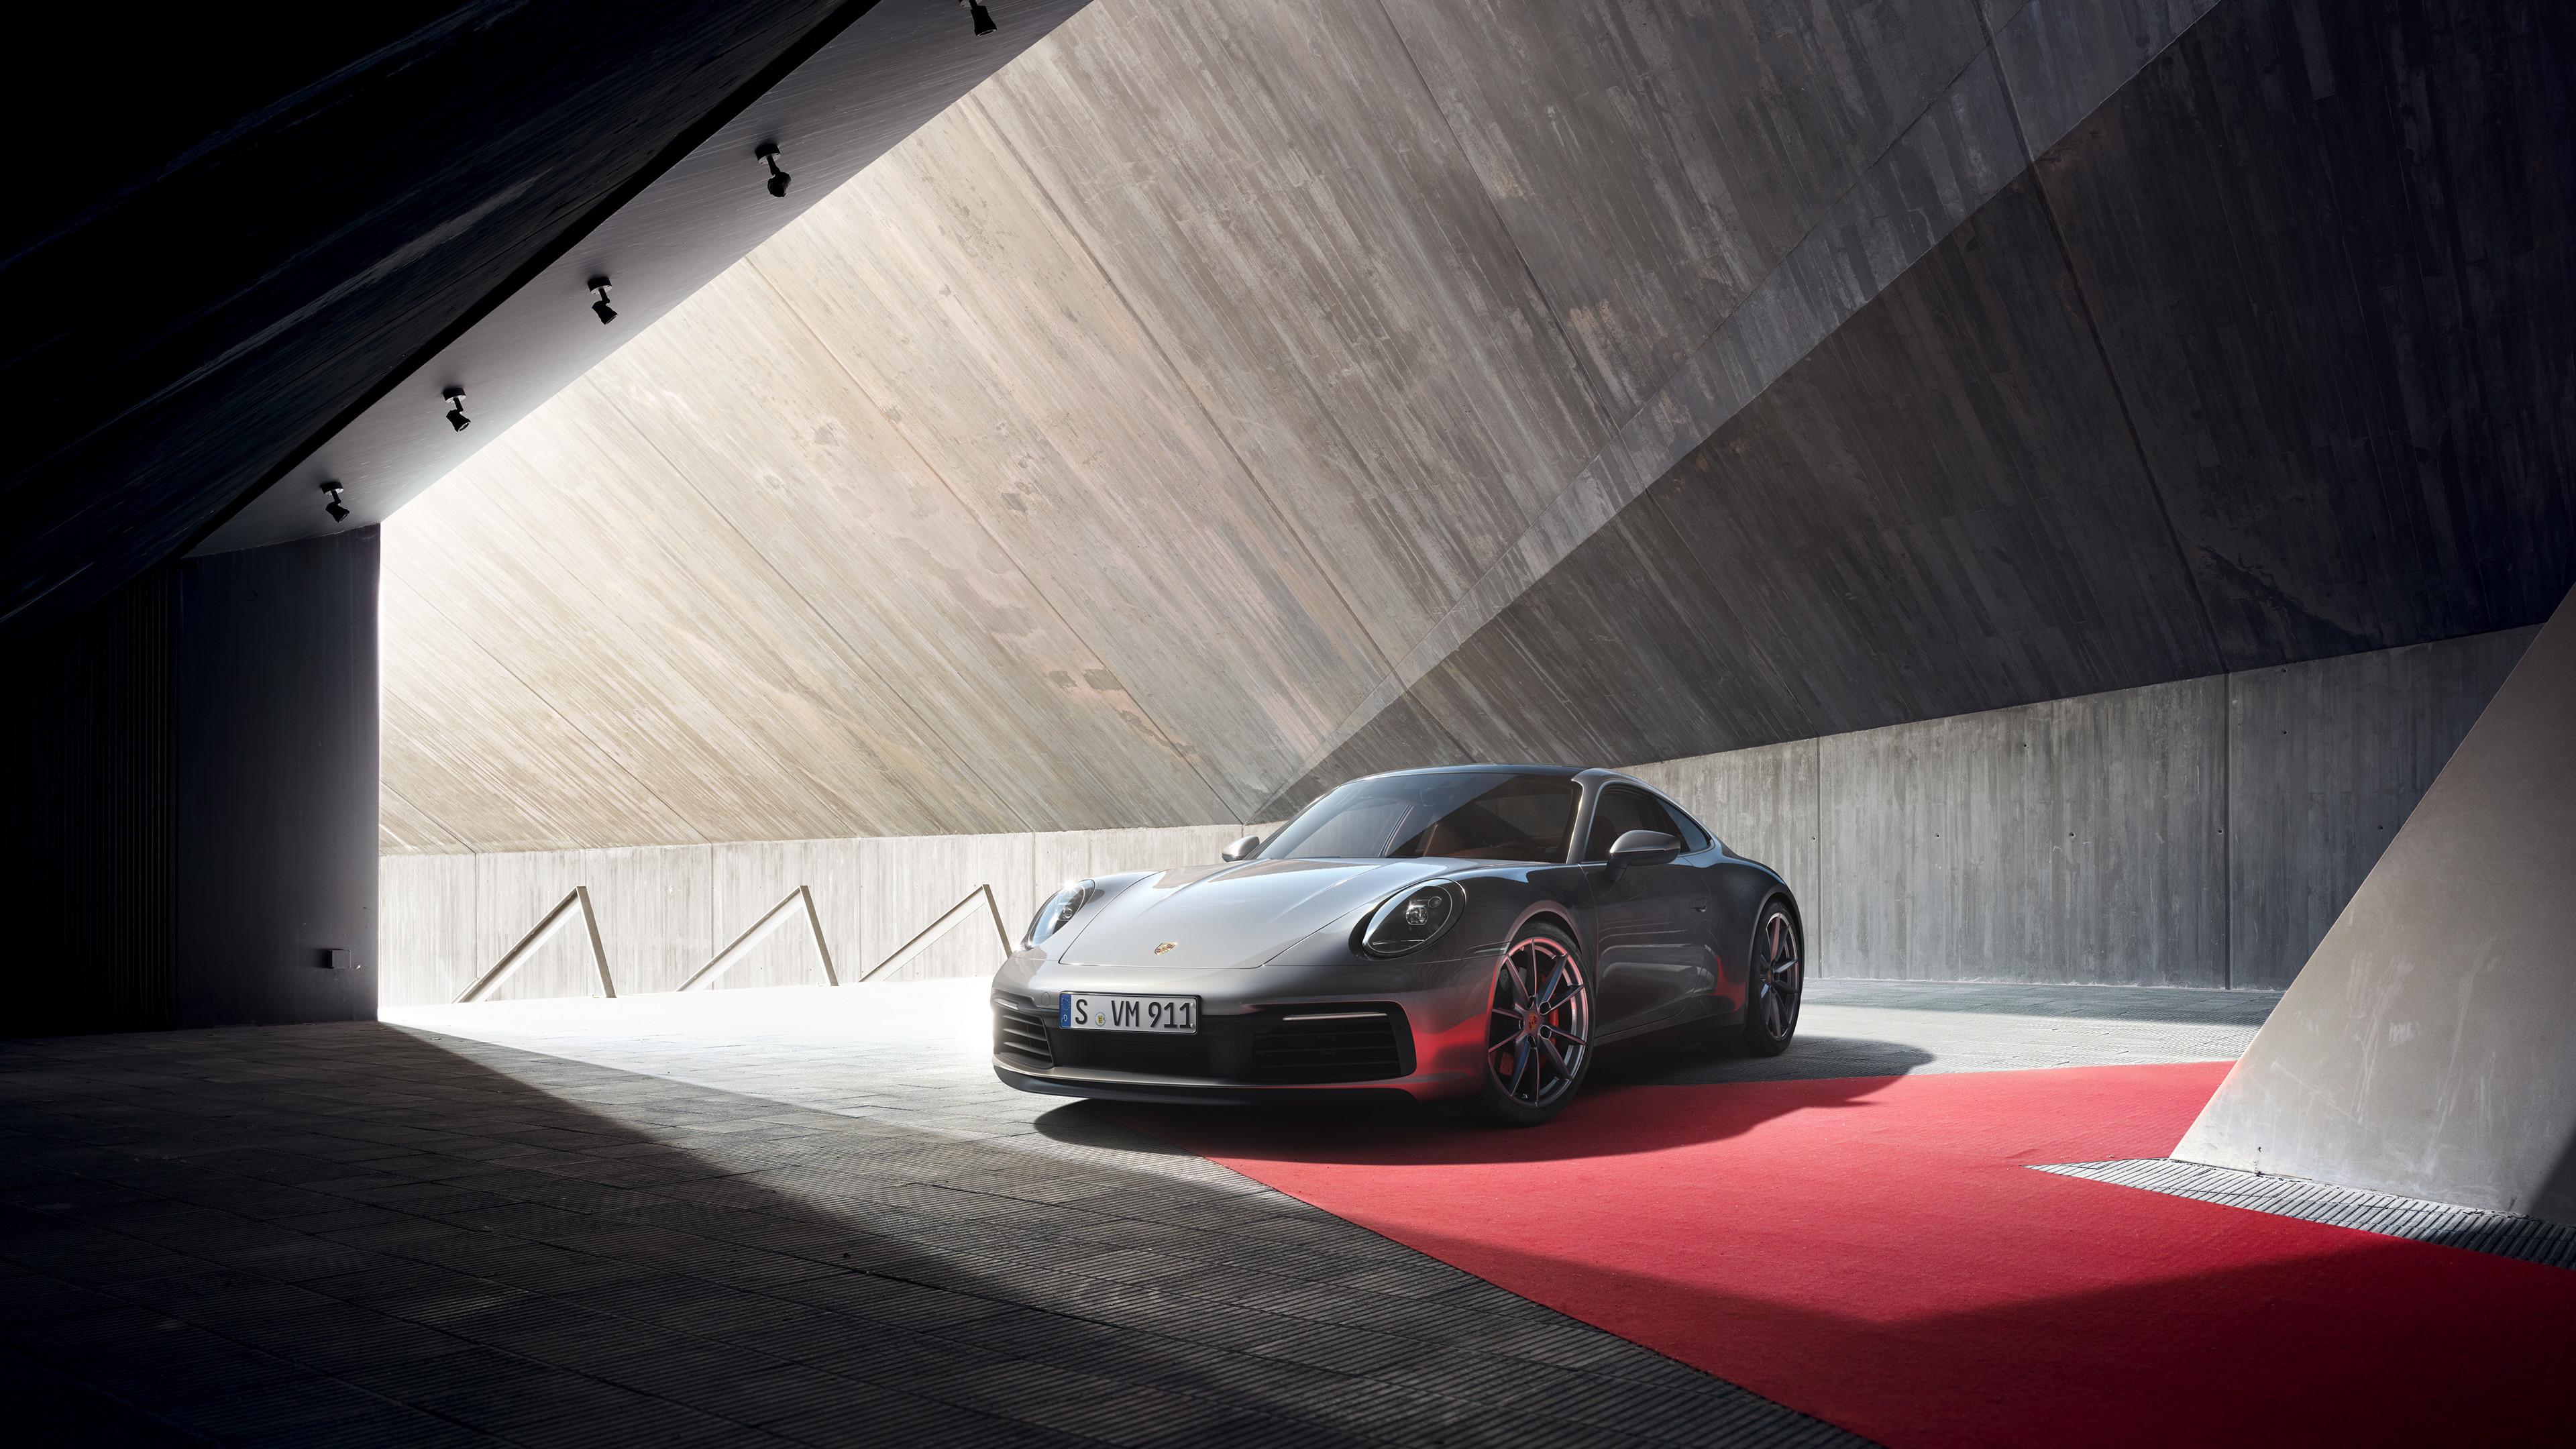 porsche 911 front 4k 1547937044 - Porsche 911 Front 4k - porsche wallpapers, porsche 911 wallpapers, hd-wallpapers, cars wallpapers, behance wallpapers, 4k-wallpapers, 2018 cars wallpapers